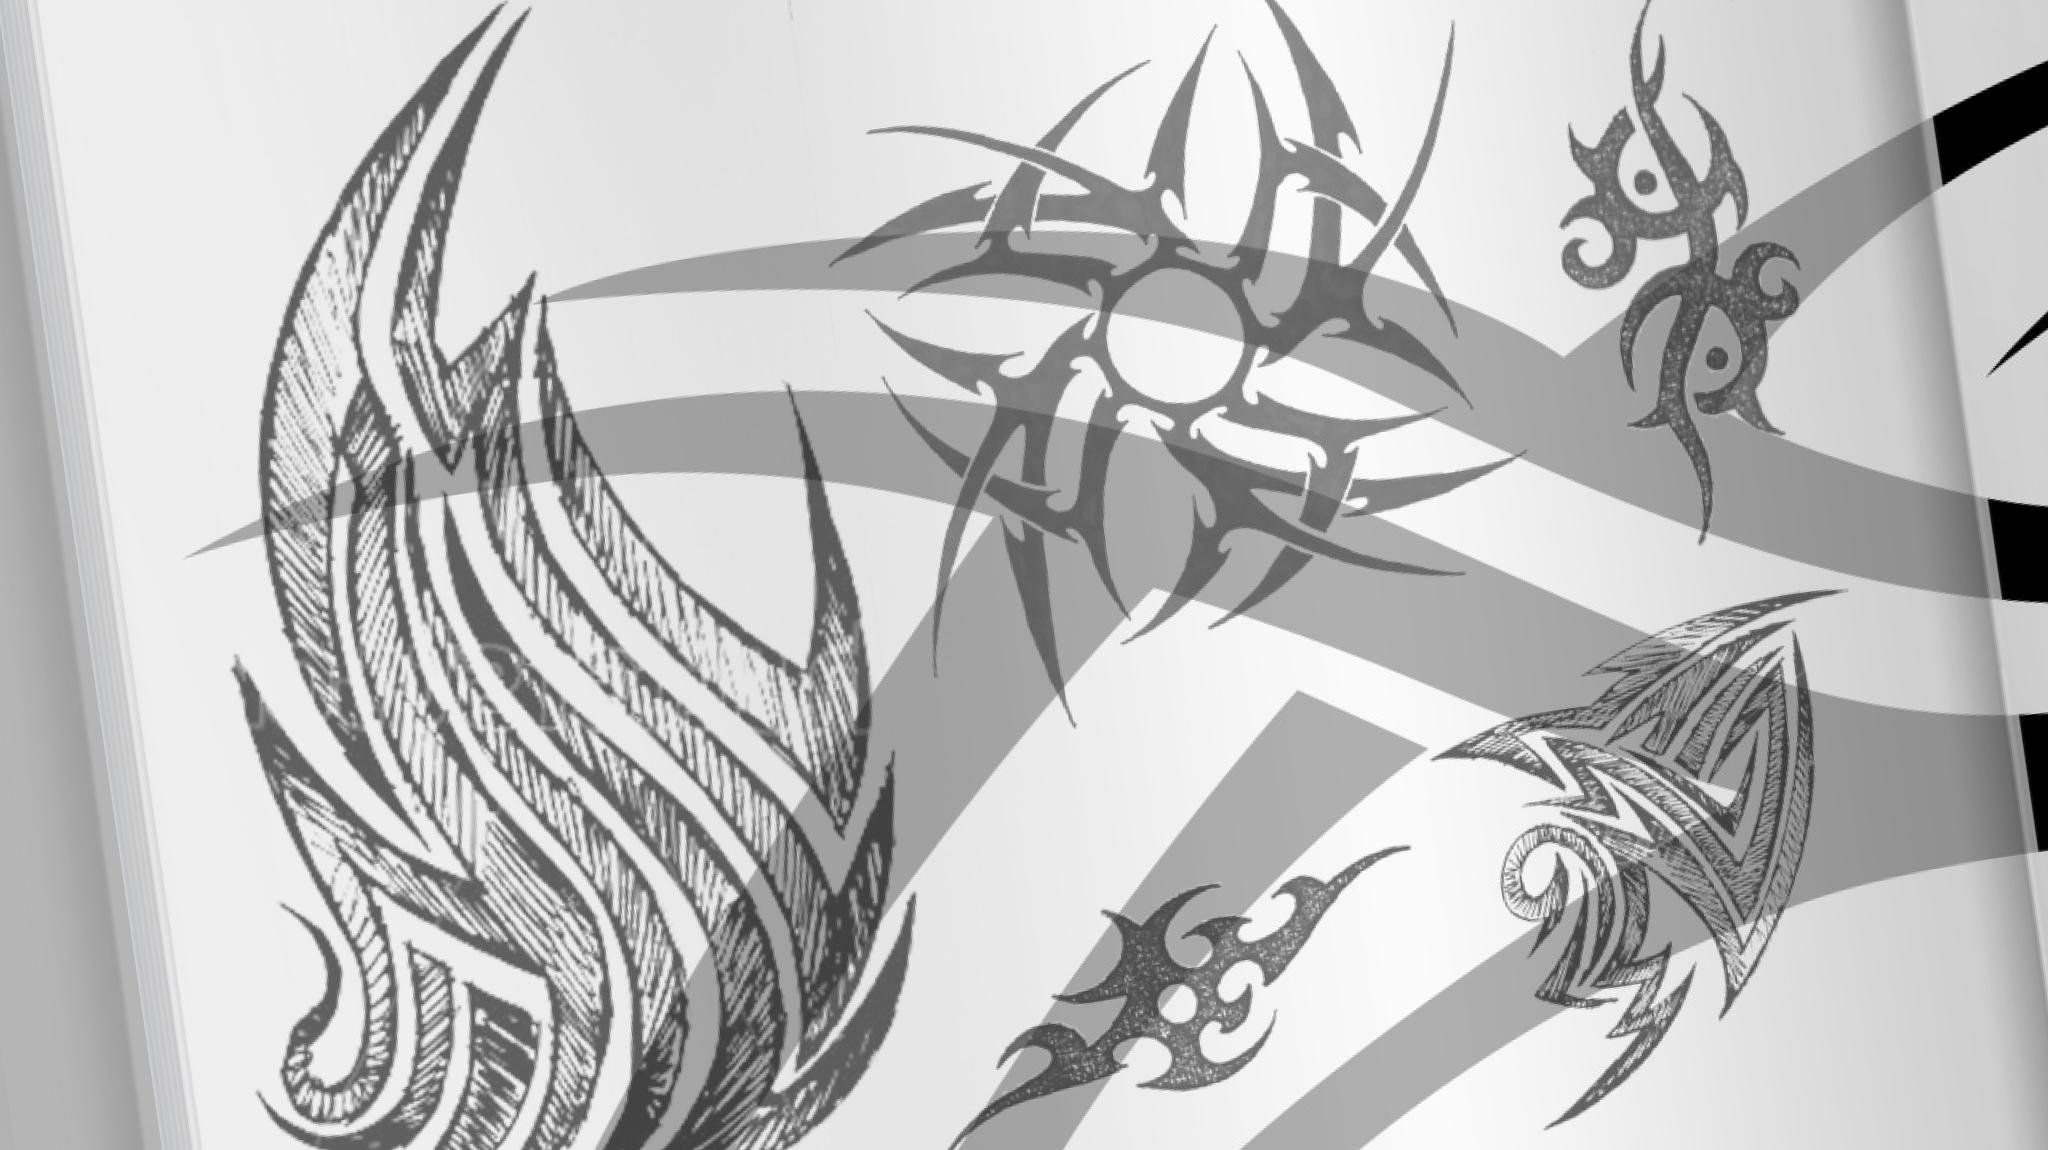 Tattoo_VirtualDetail04.jpg